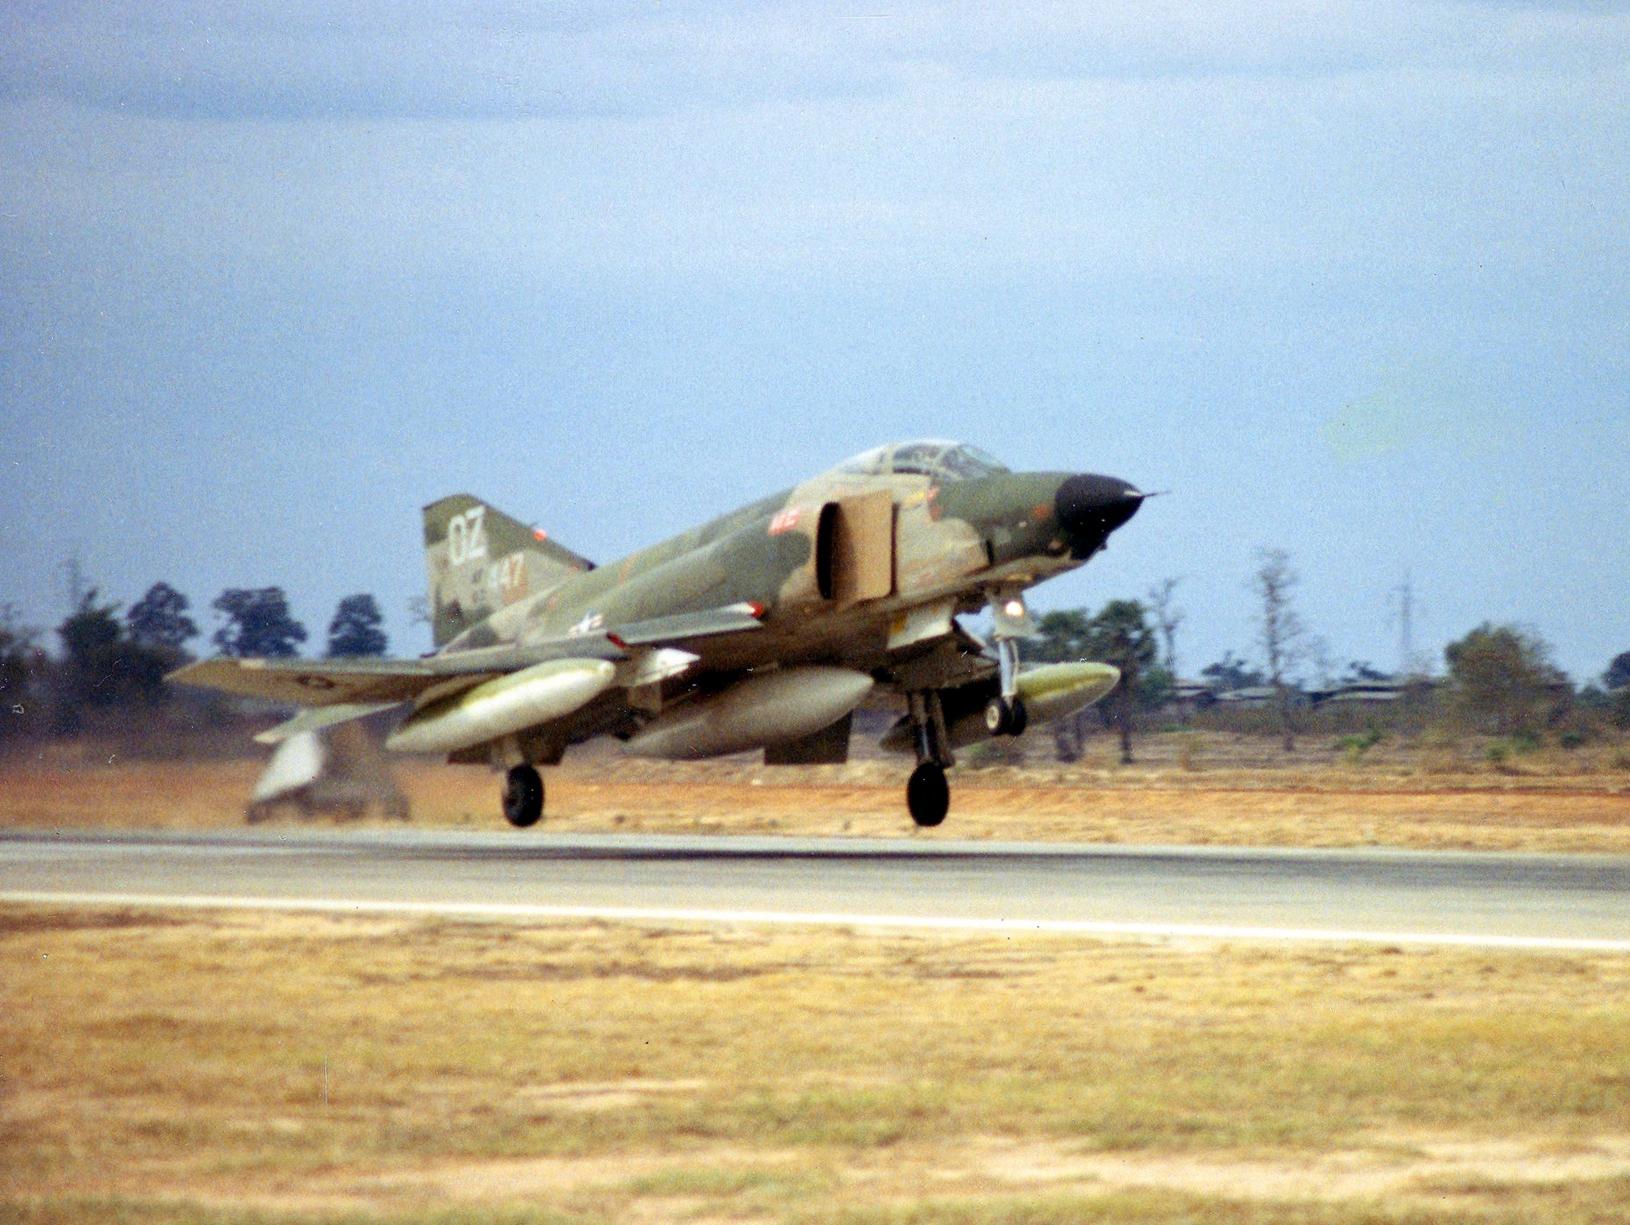 File Rf 4c Phantom 14th Trs Landing At Udorn Rtafb In 1968